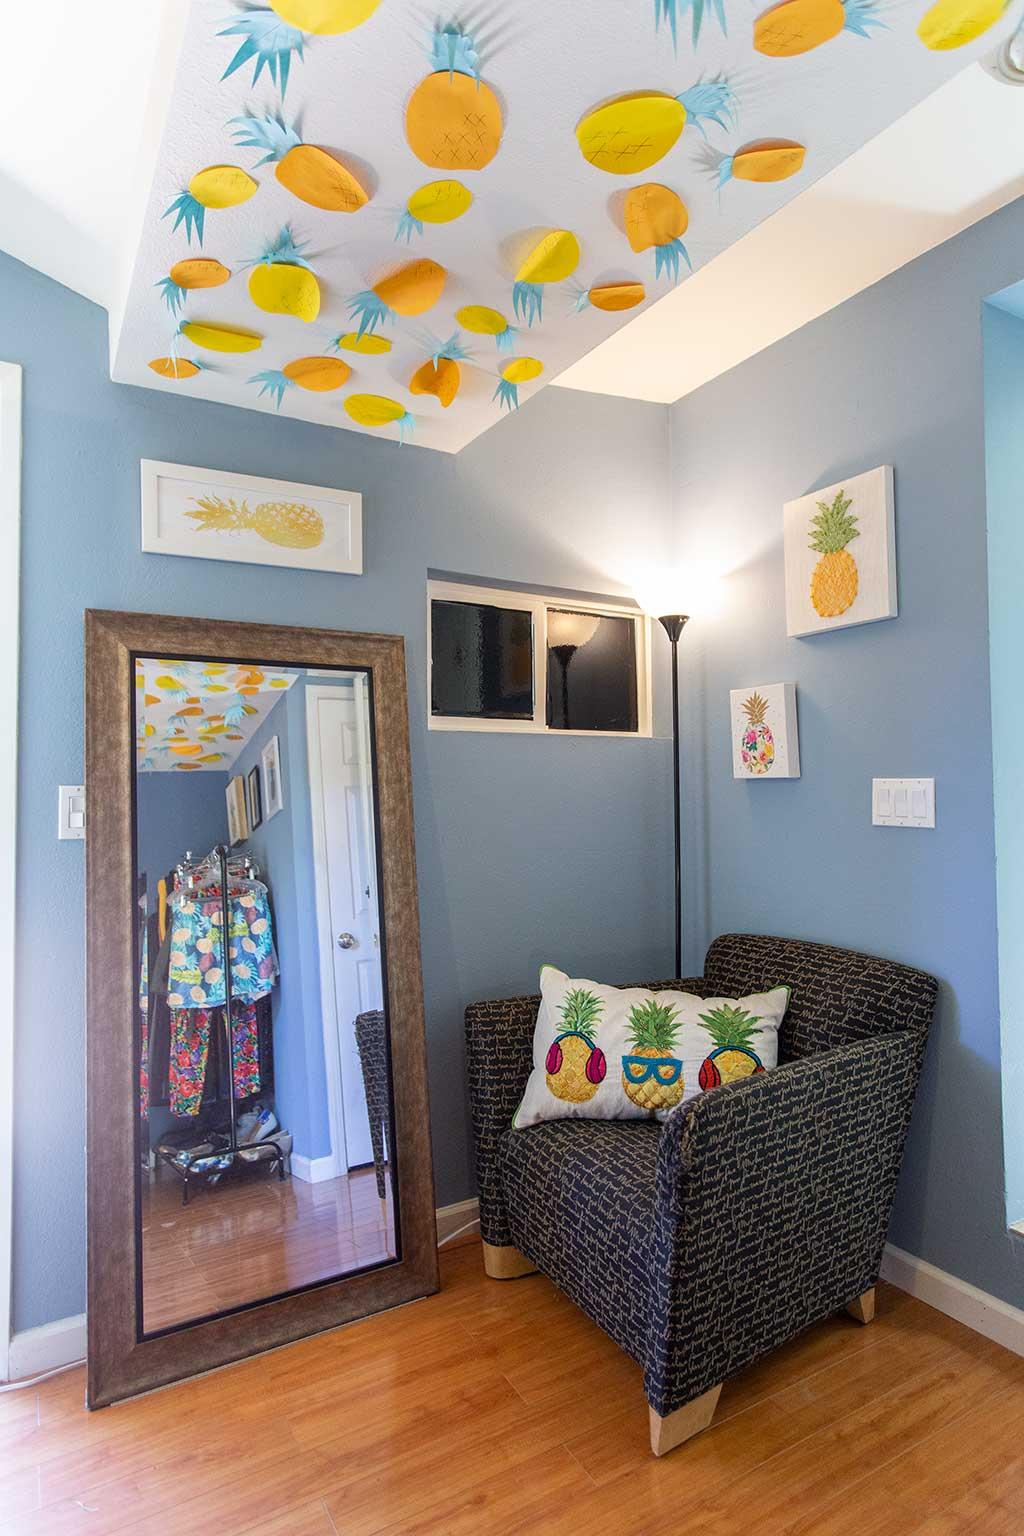 drive-swim-fly-san-juan-bautista-california-willis-cottage-bedroom-mirror-arm-chair